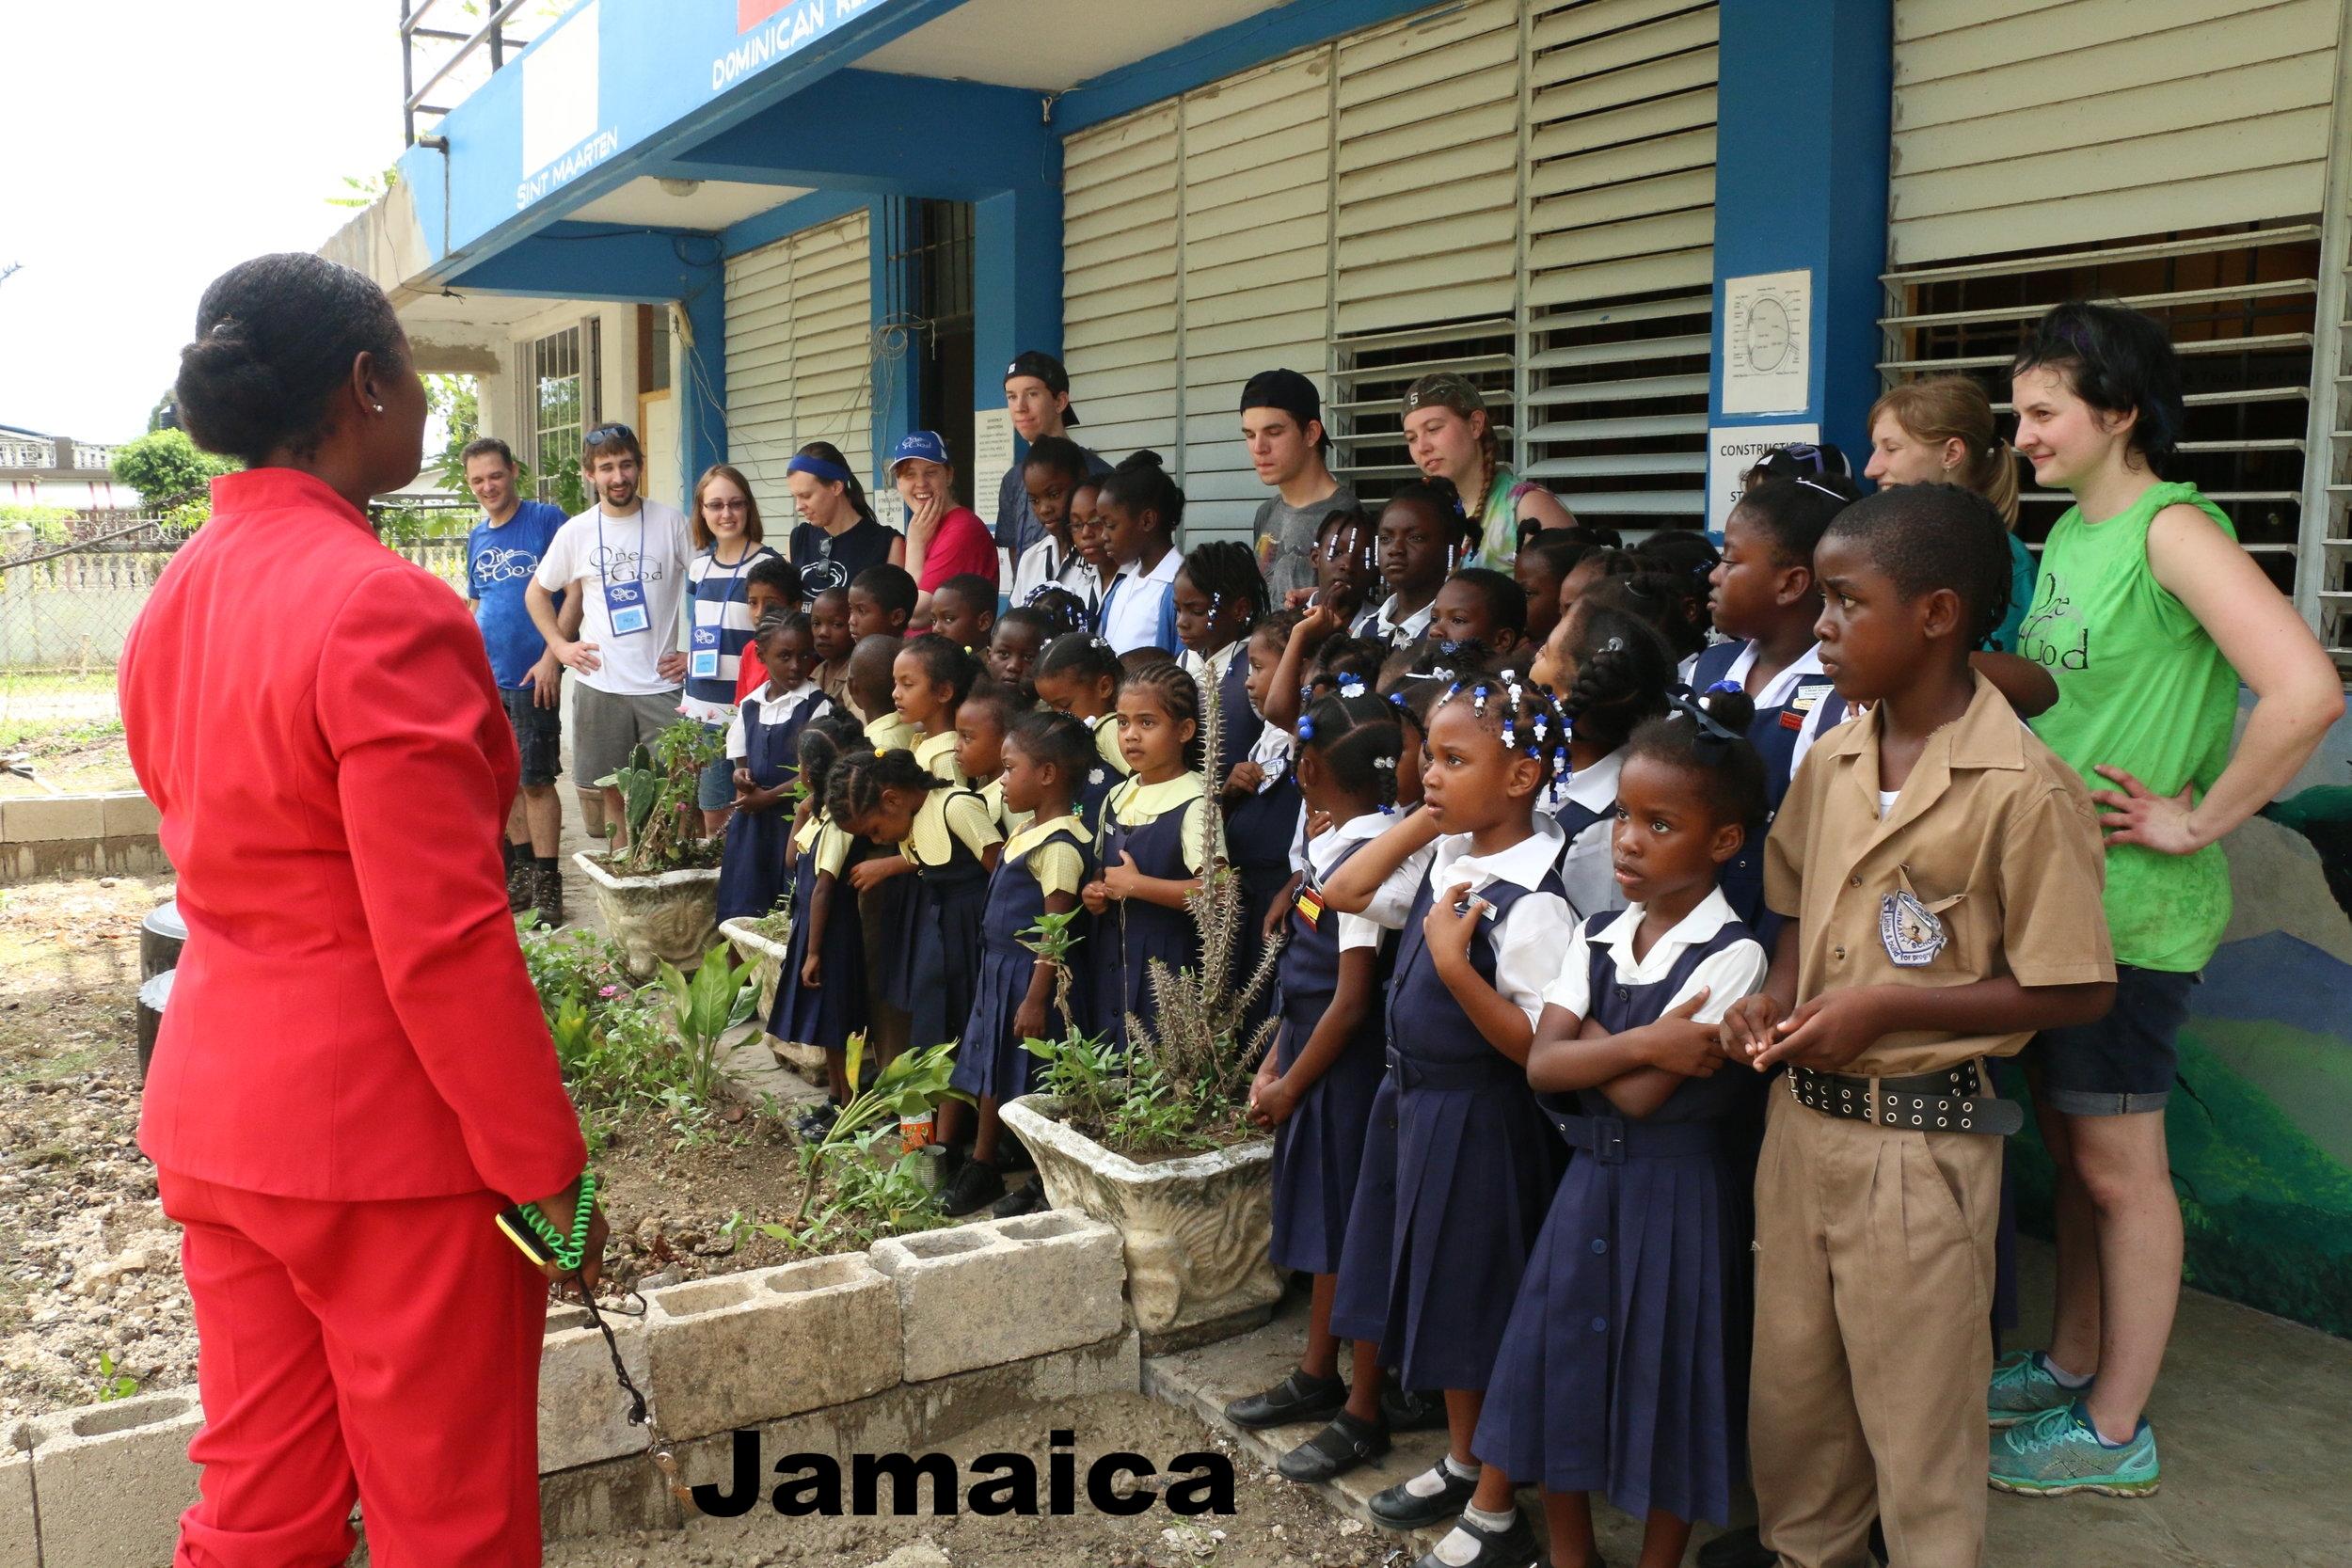 Jamaica team .jpg